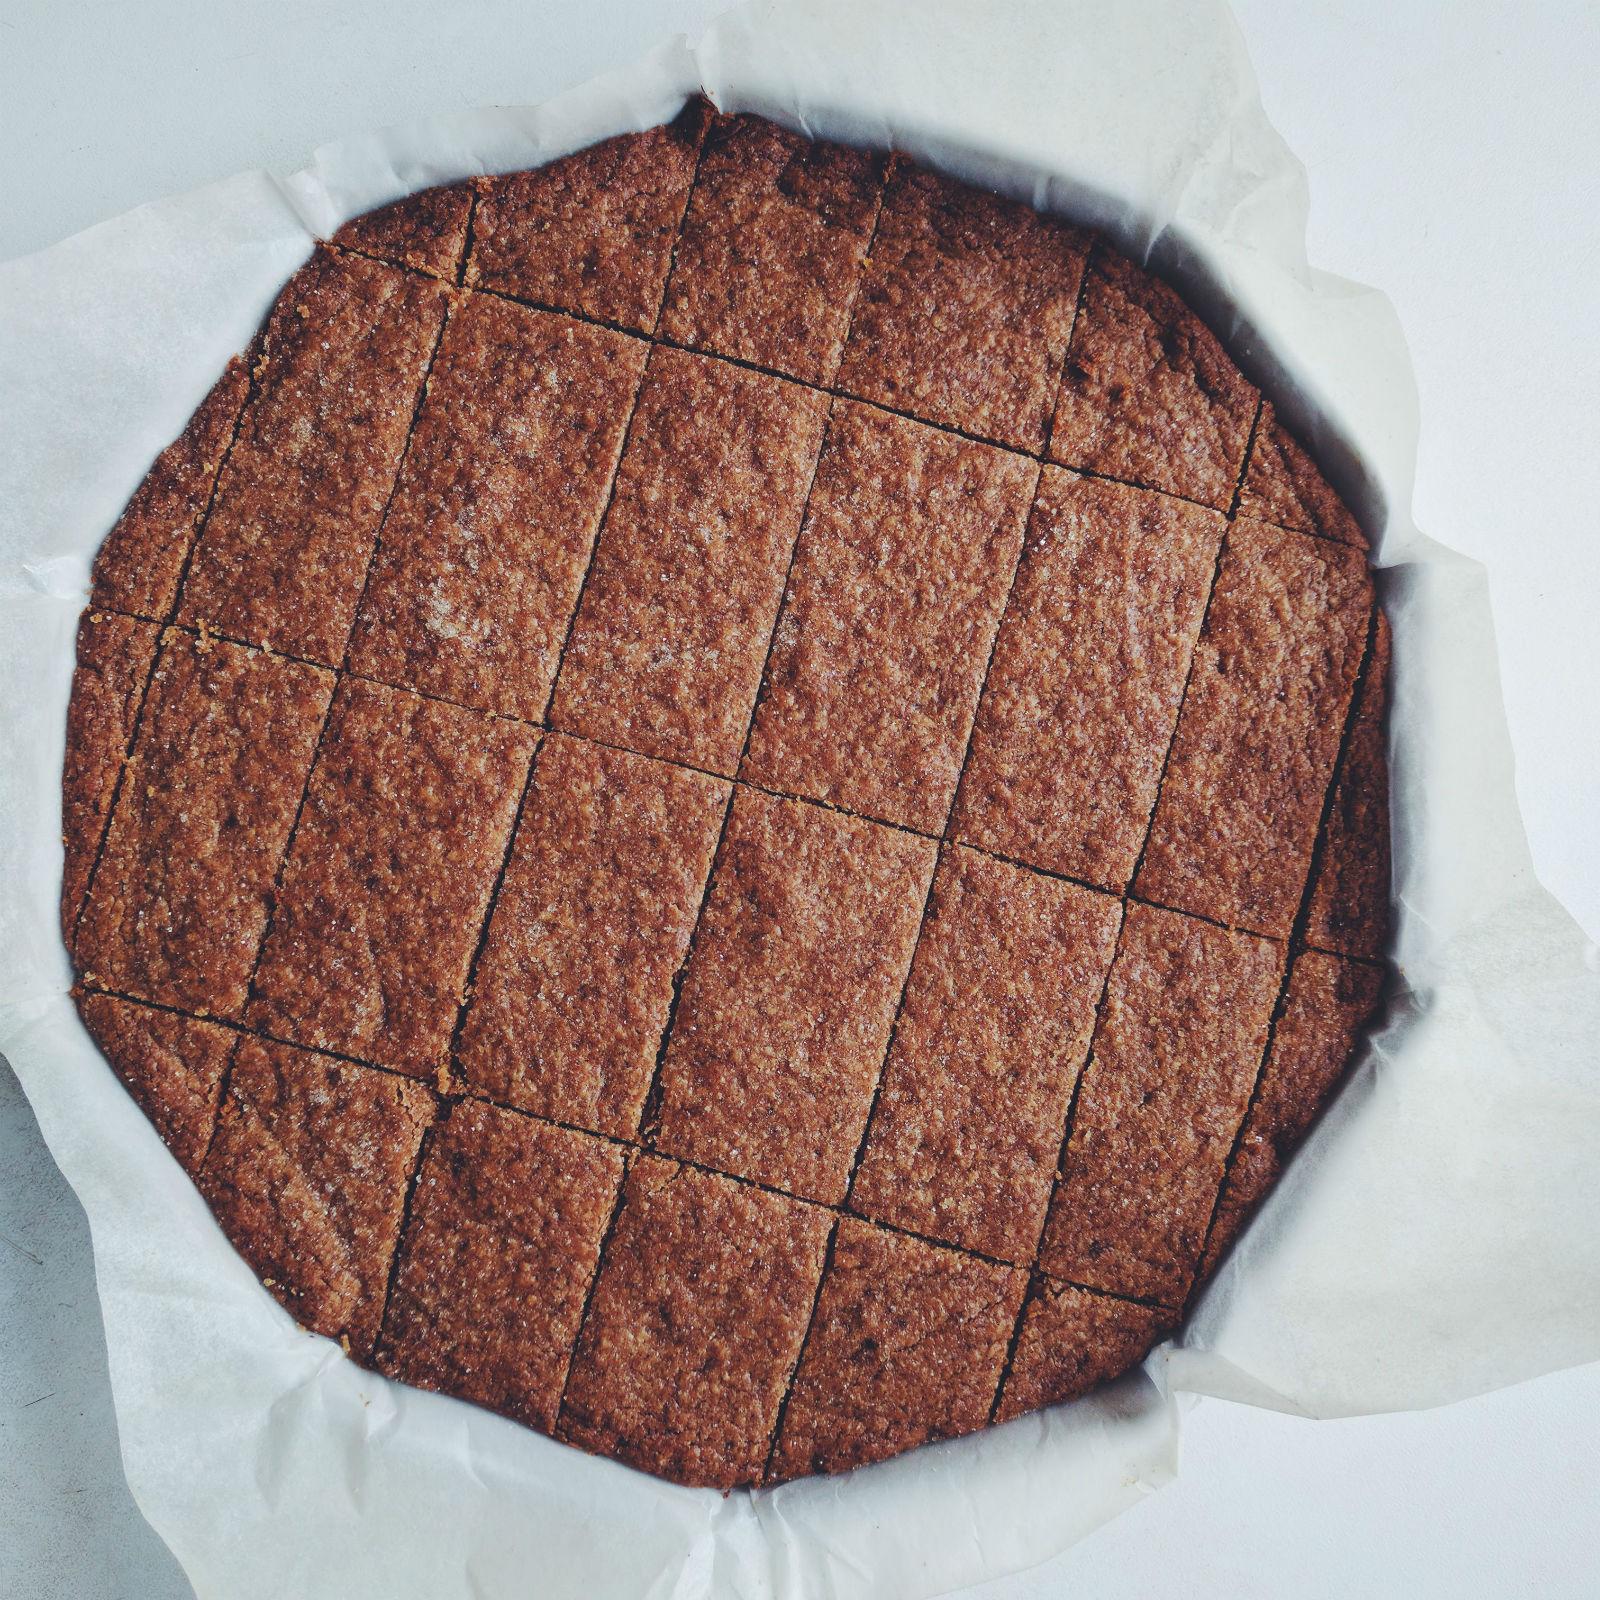 Lemon buckwheat shortbread: in the pan after baking